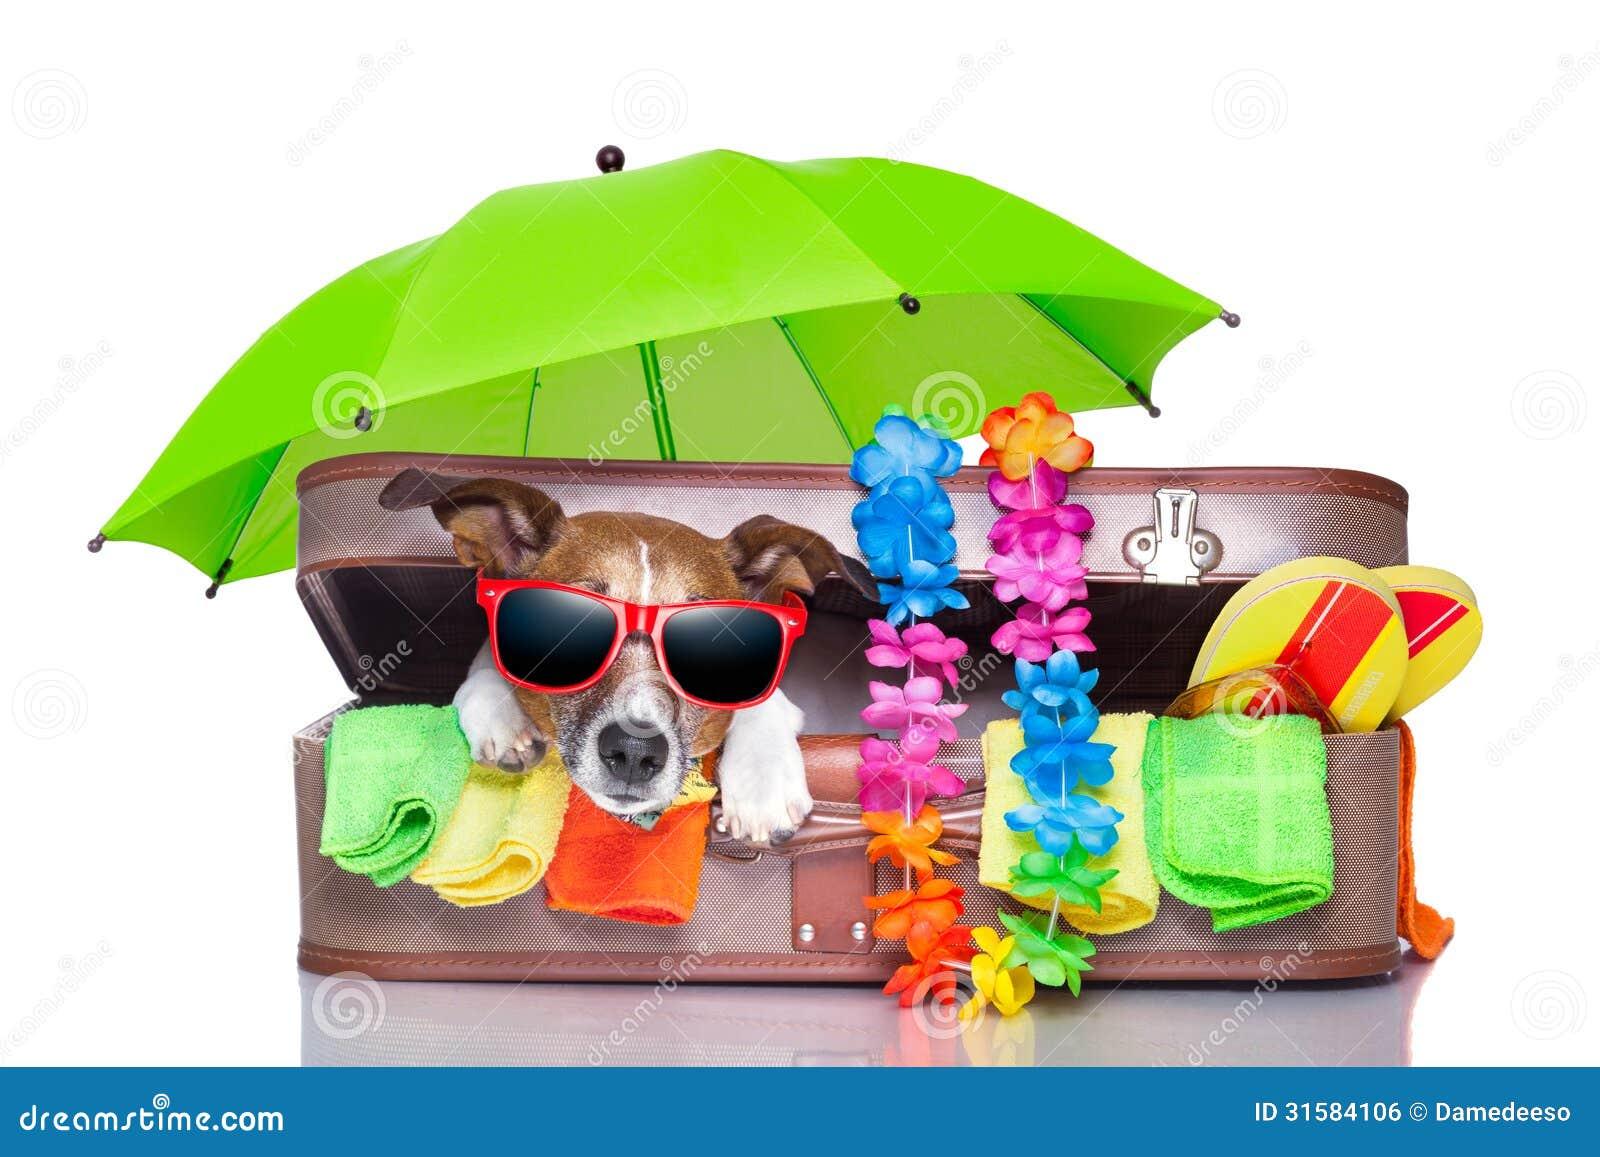 Air Bag Jack >> Summer holiday dog stock photo. Image of baggage, isolated - 31584106